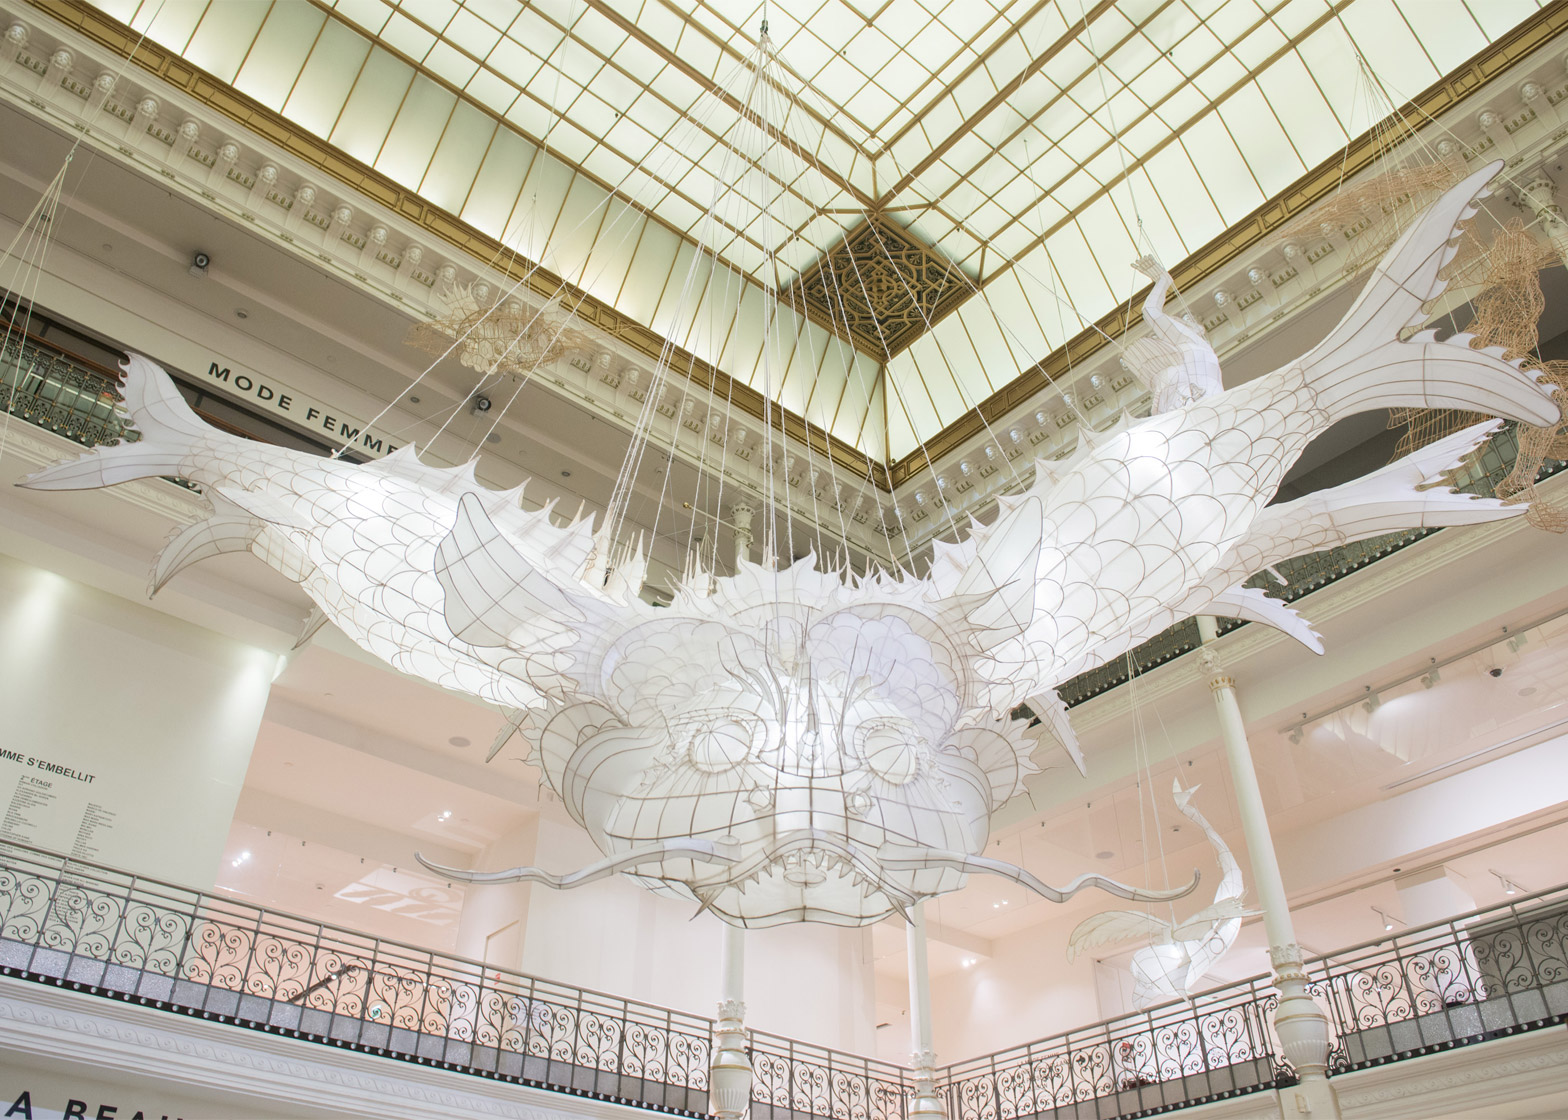 ai-wei-wei-er-xi-exhibition-le-bon-marche-2016_dezeen_1568_6.jpg